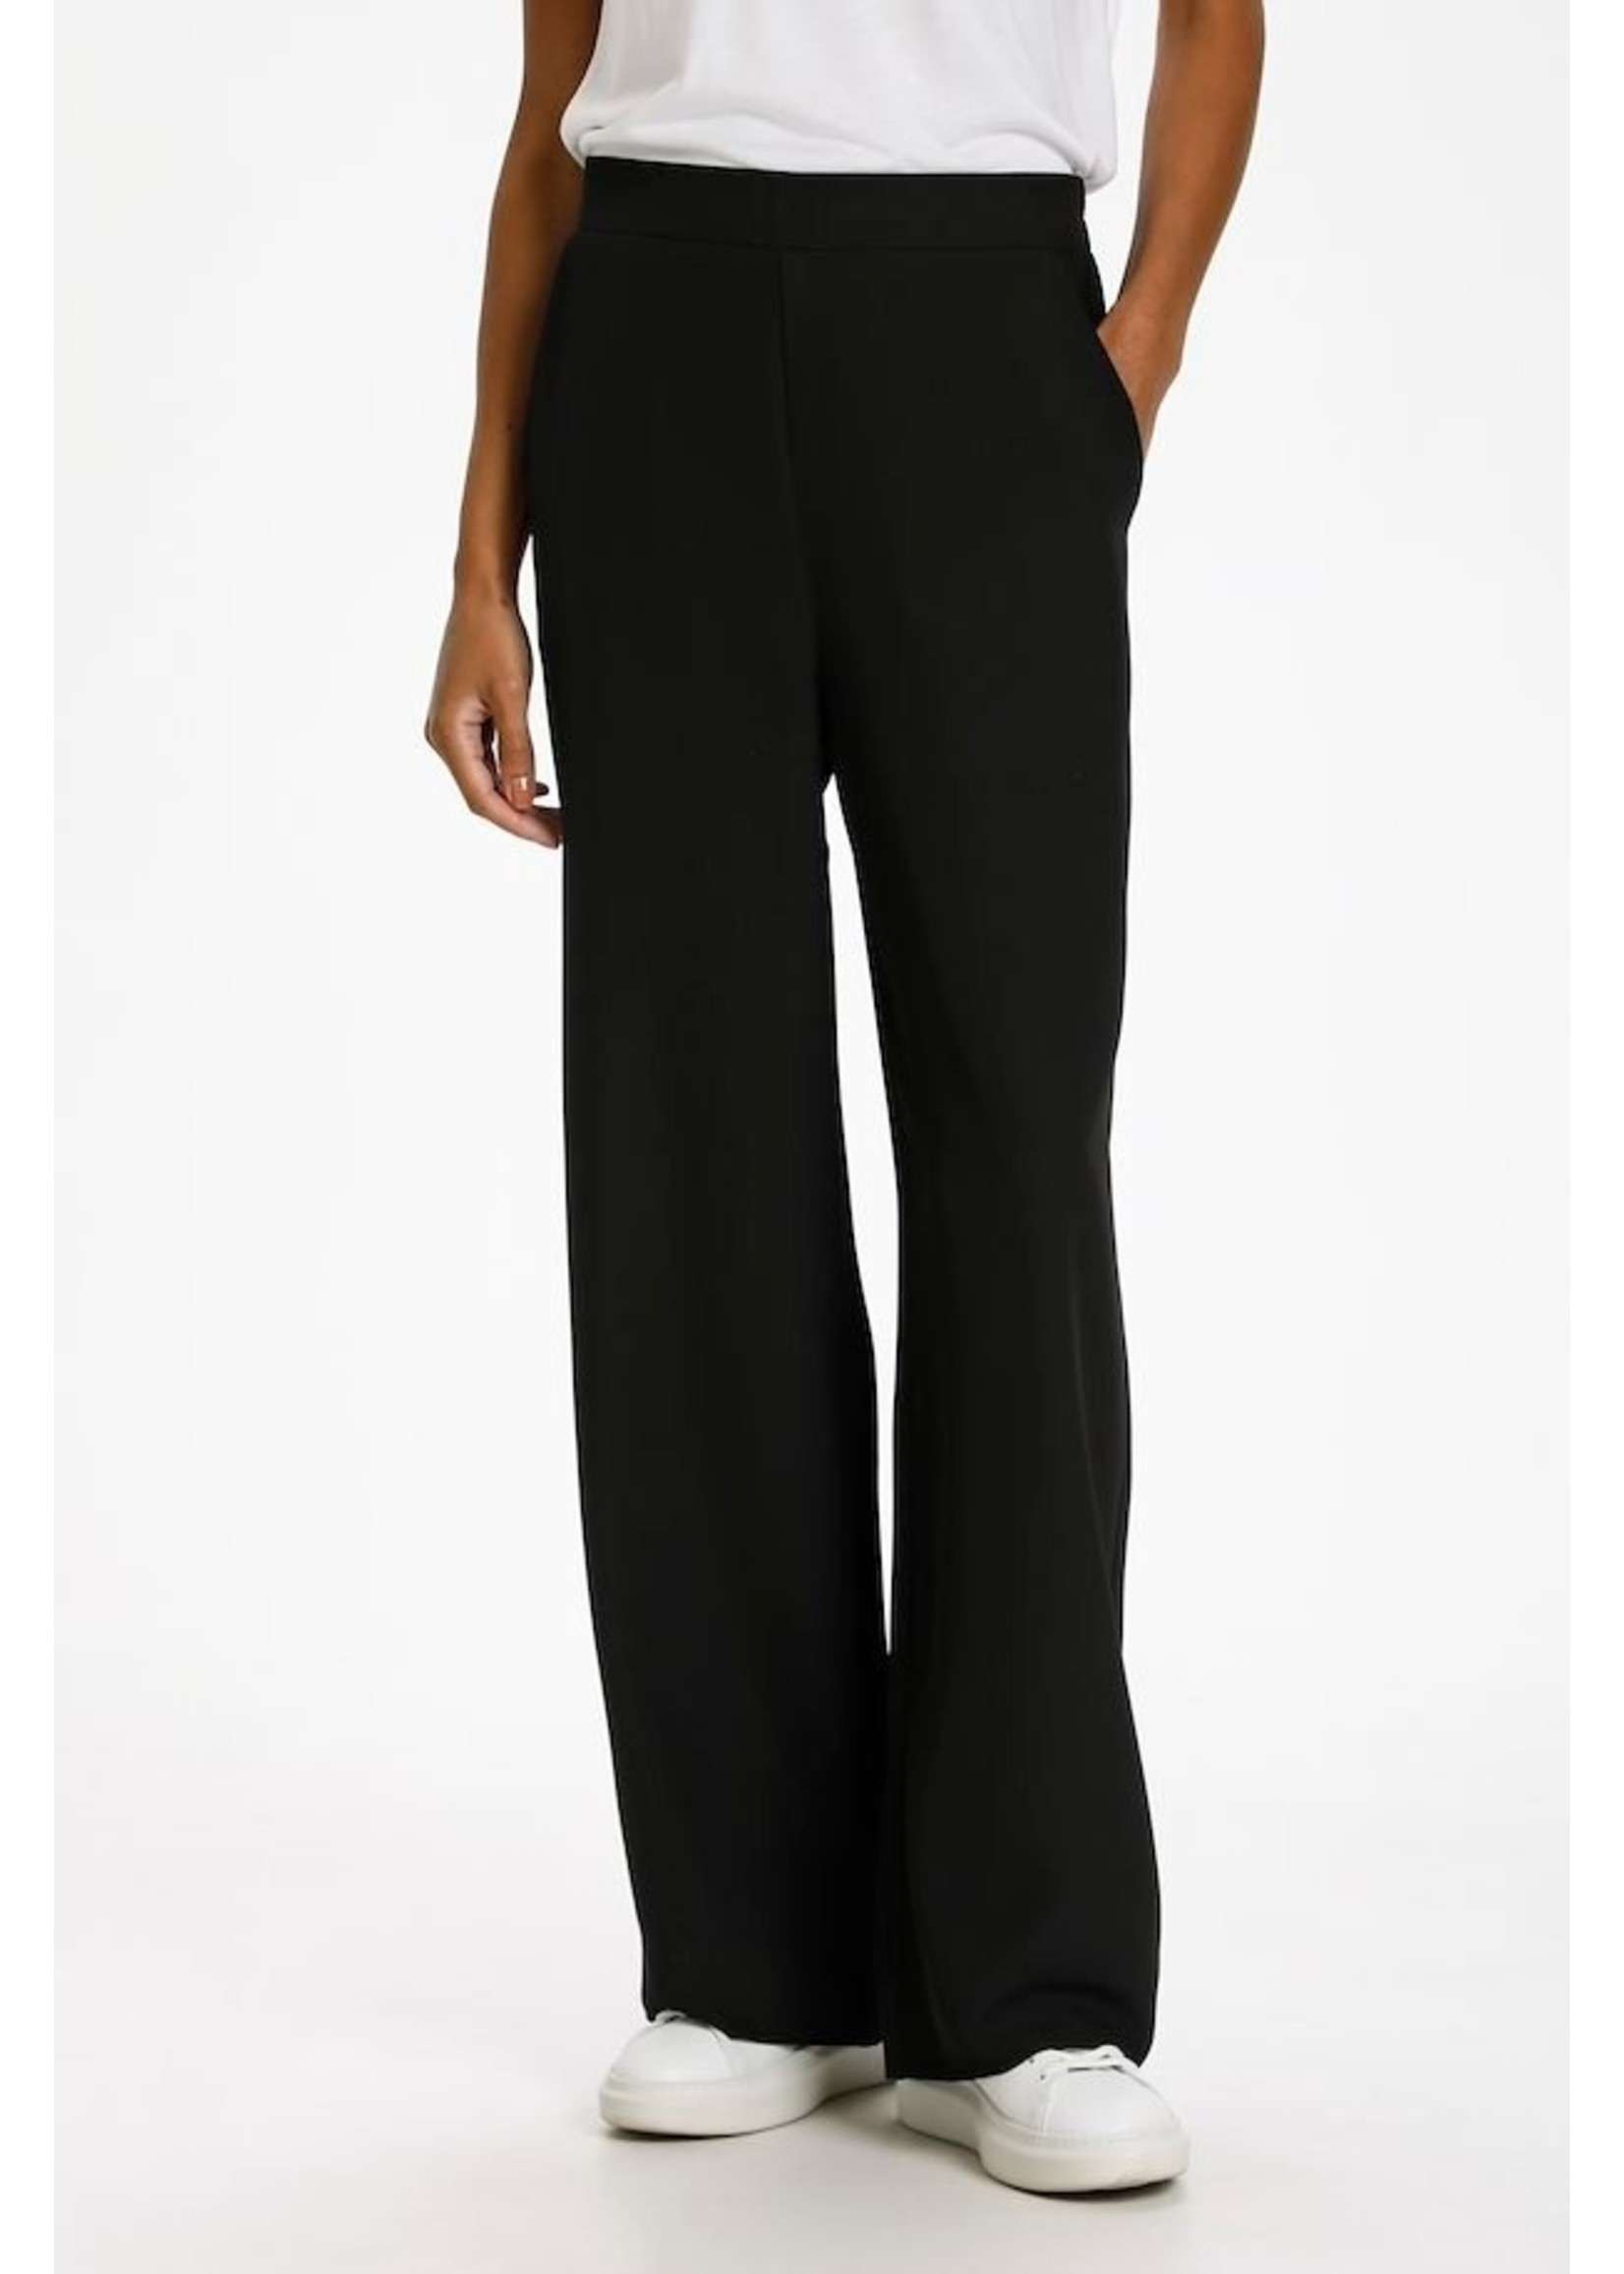 Kaffe Black wide pants